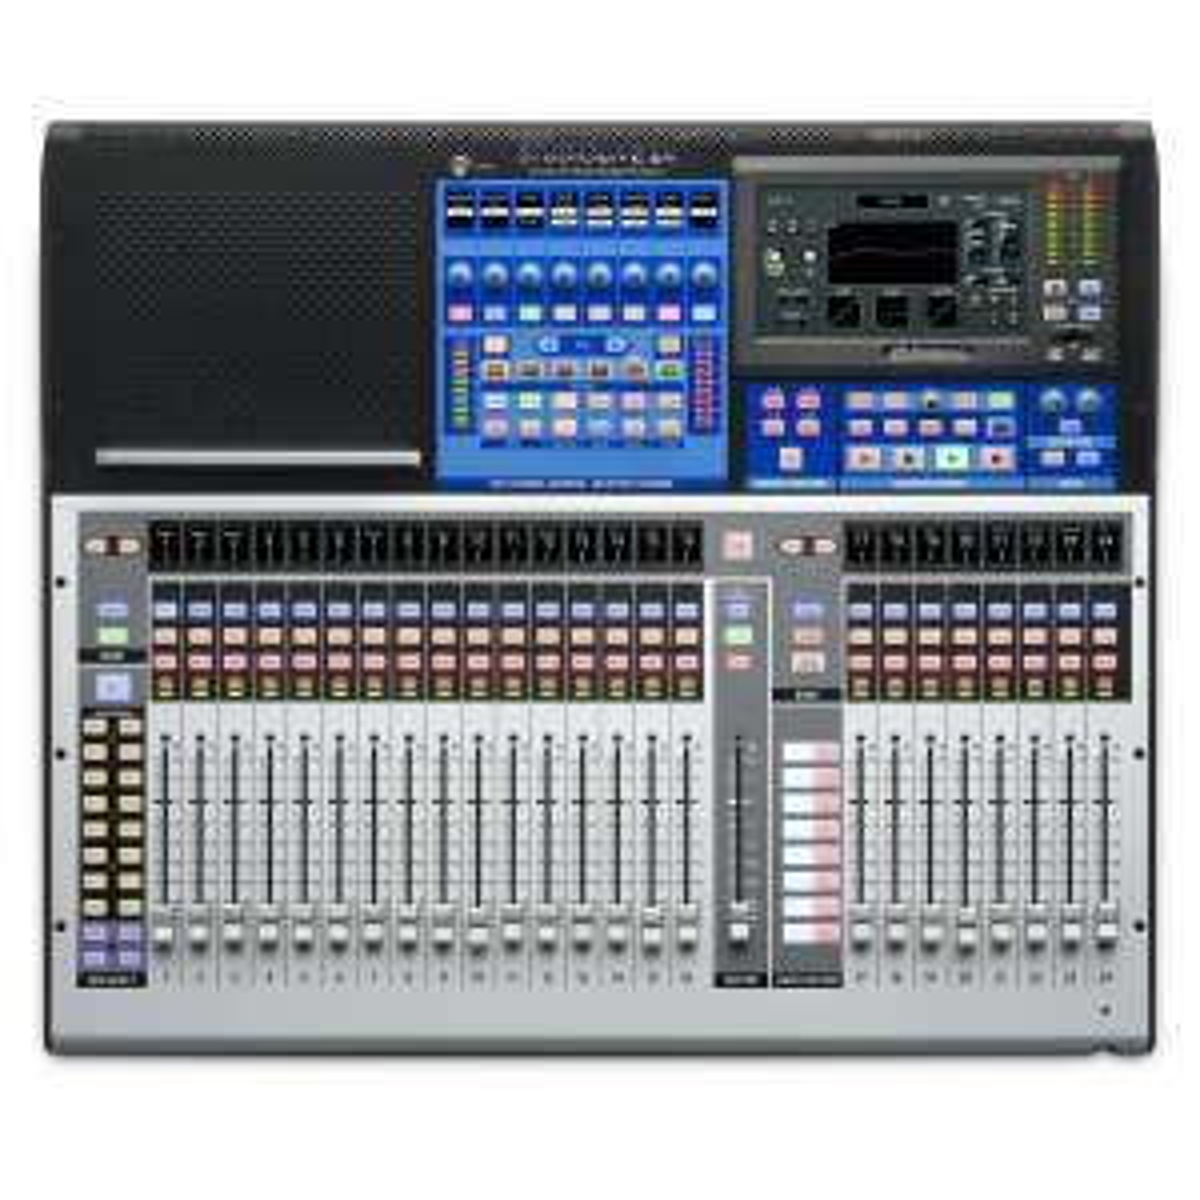 Presonus StudioLive 24 Series III: Digitalmixer (38x38 USB Interface, 55x55 AVB Interface, 25 Motorfador, 24 DCA-Gruppen,